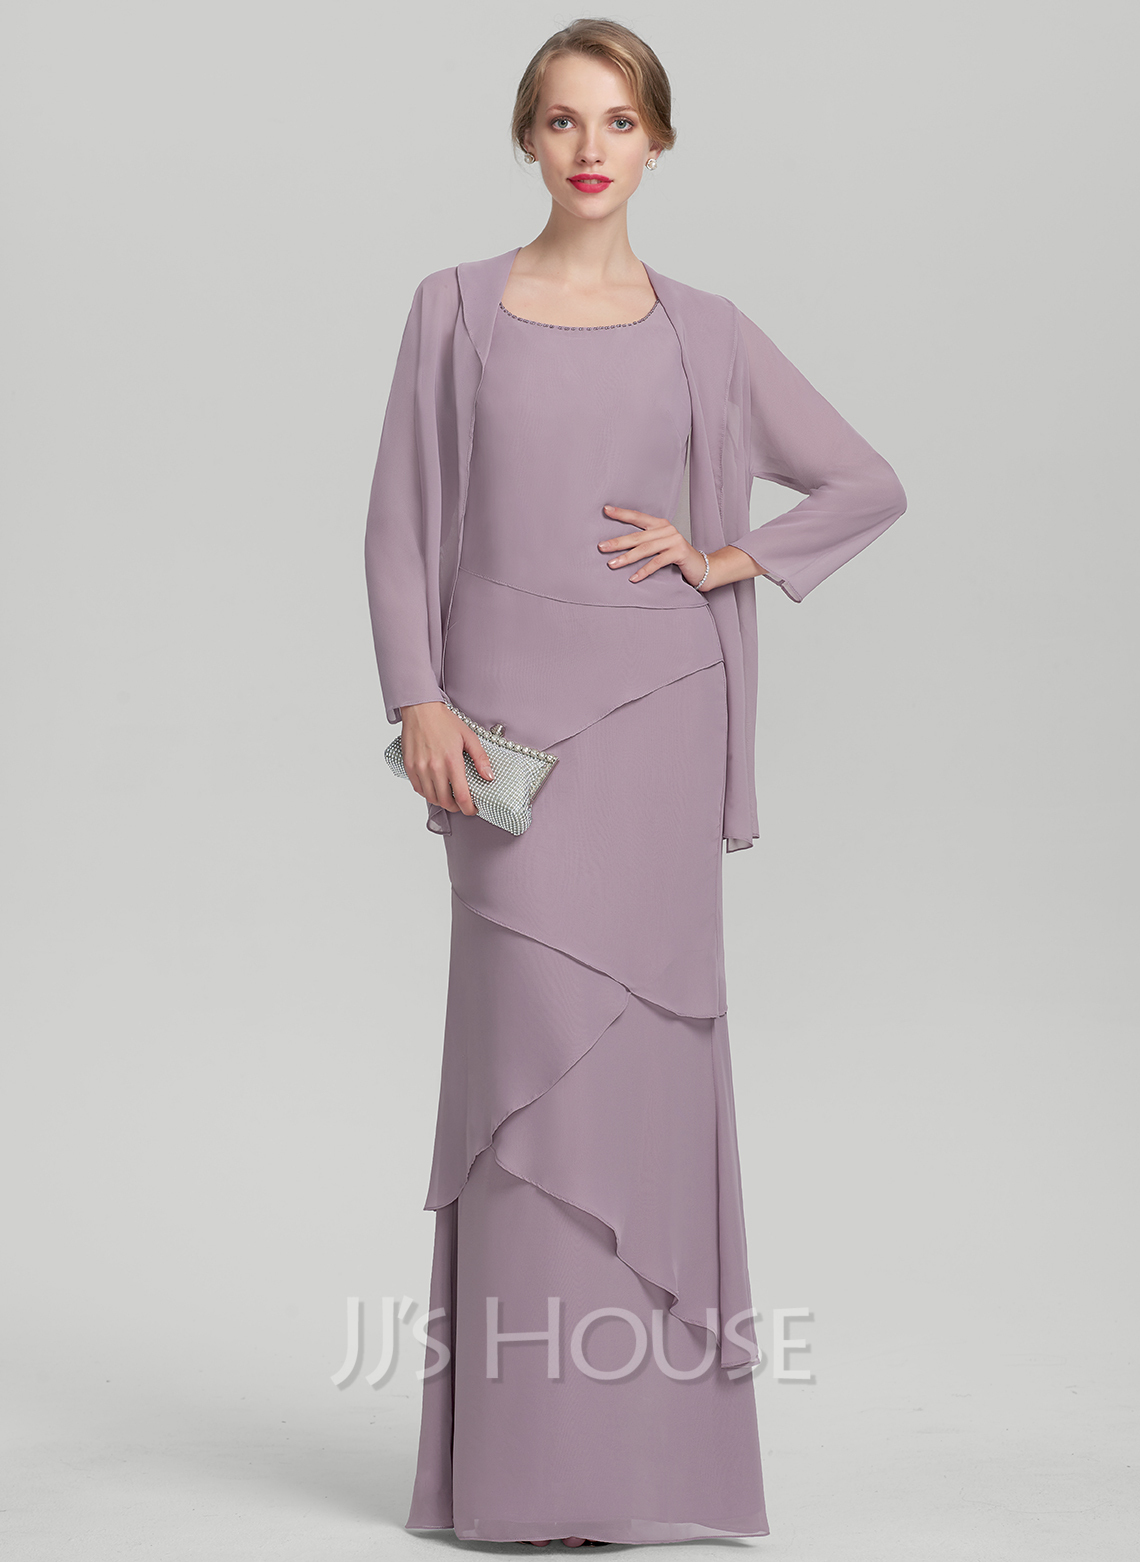 Sheath/Column Scoop Neck Floor-Length Chiffon Mother of the Bride Dress With Beading Cascading Ruffles